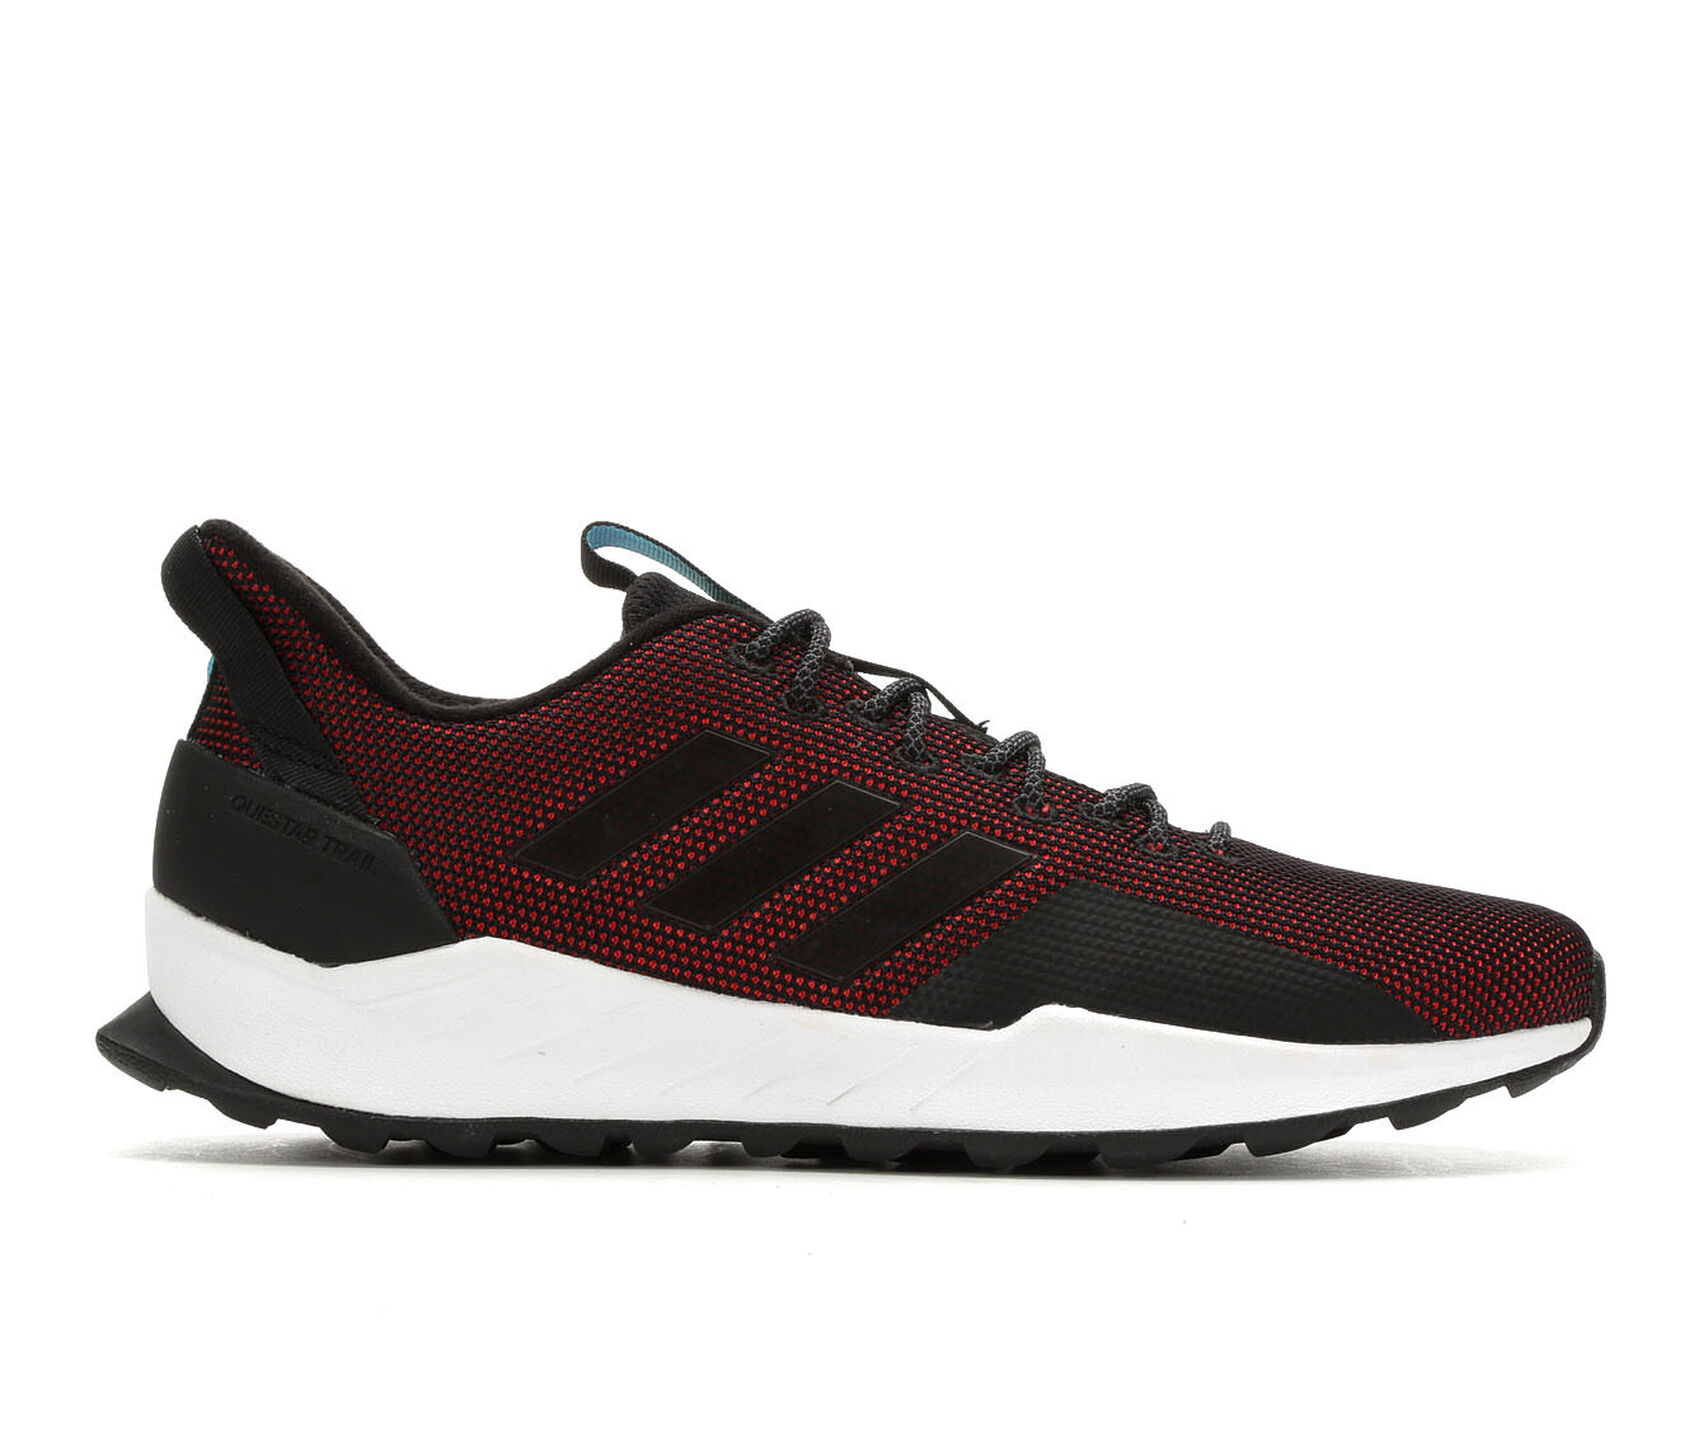 wholesale dealer 39b8f 87a99 ... Adidas Questar Trail Running Shoes. Previous